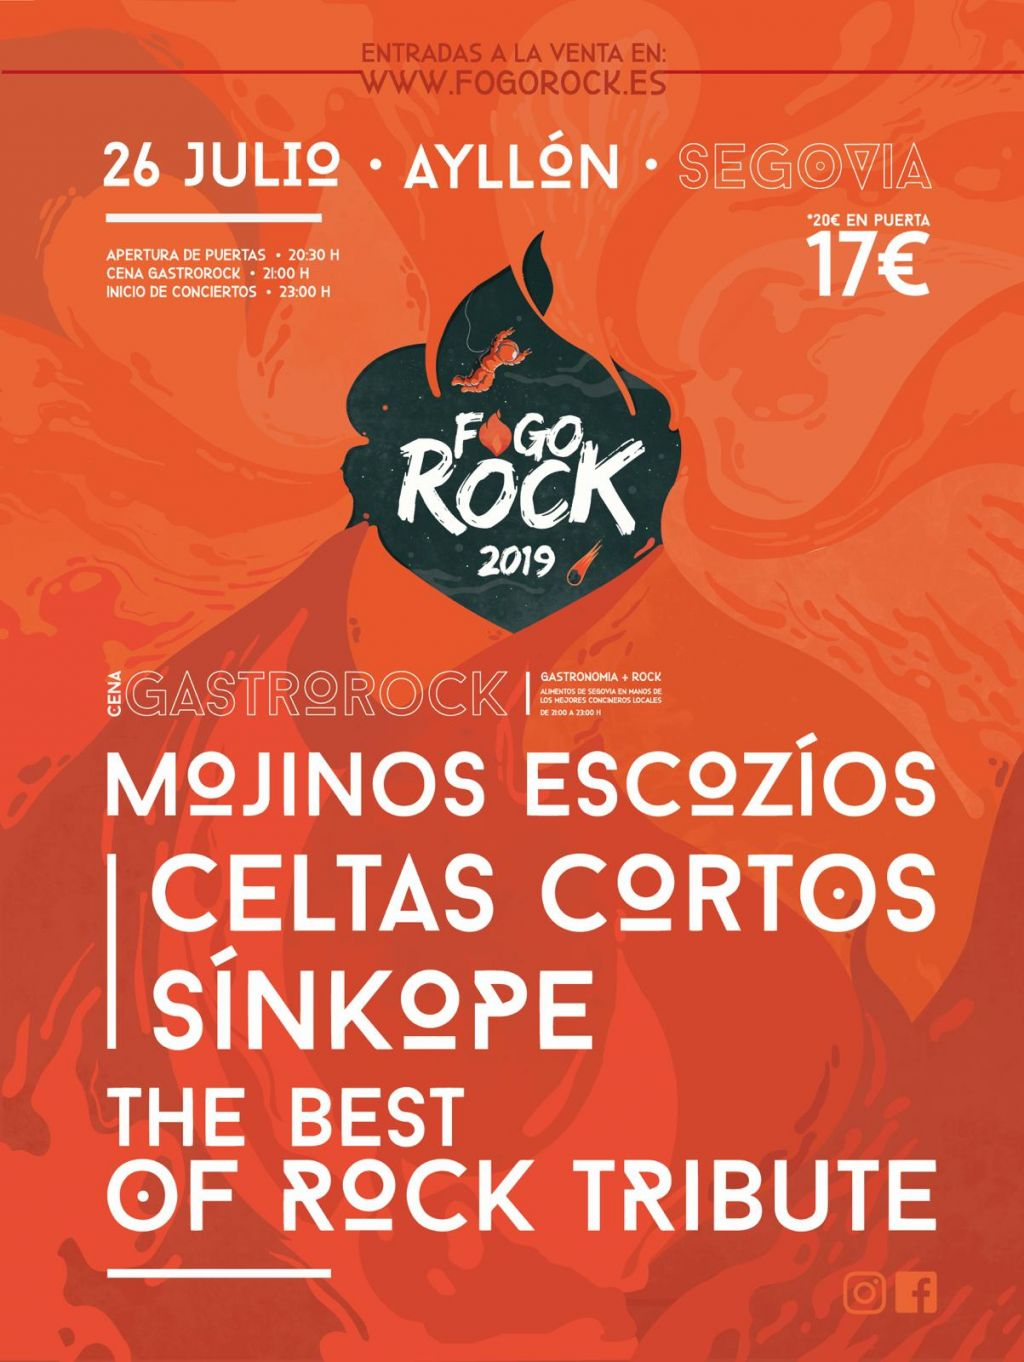 affiche de fogorock19